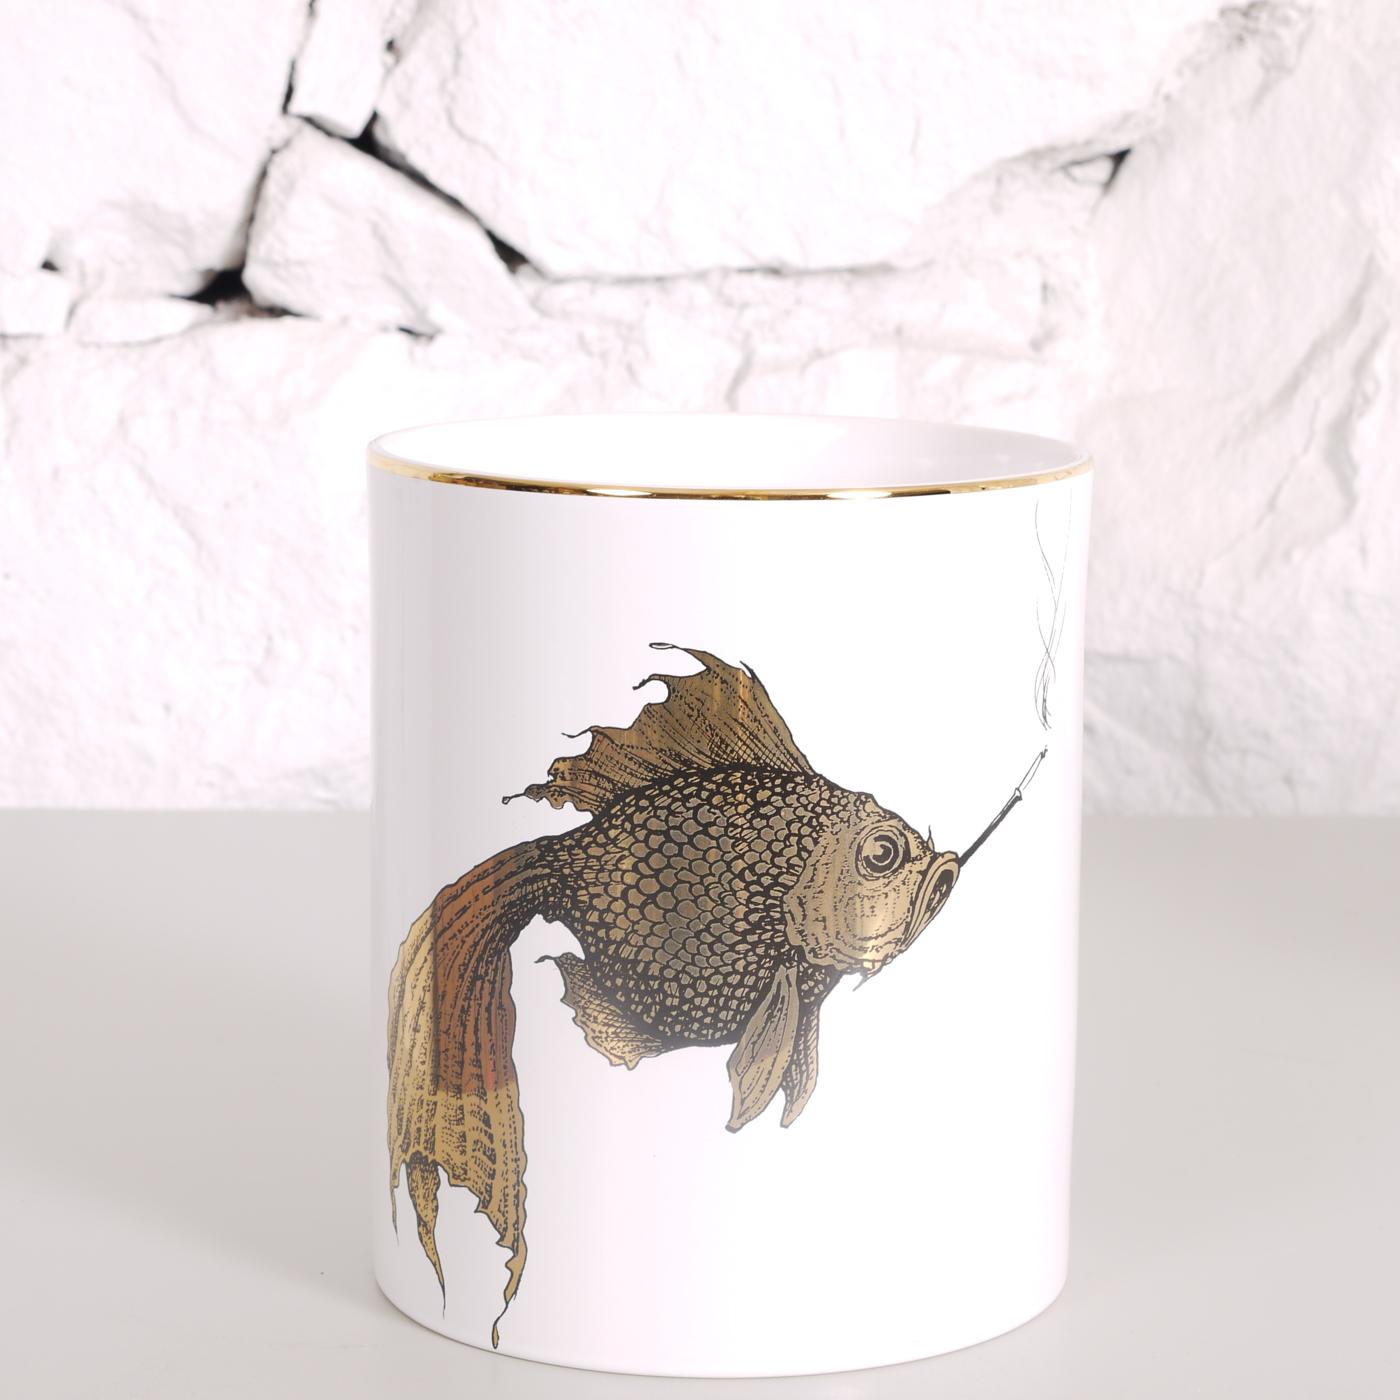 Guldfisk 2.040 SEK